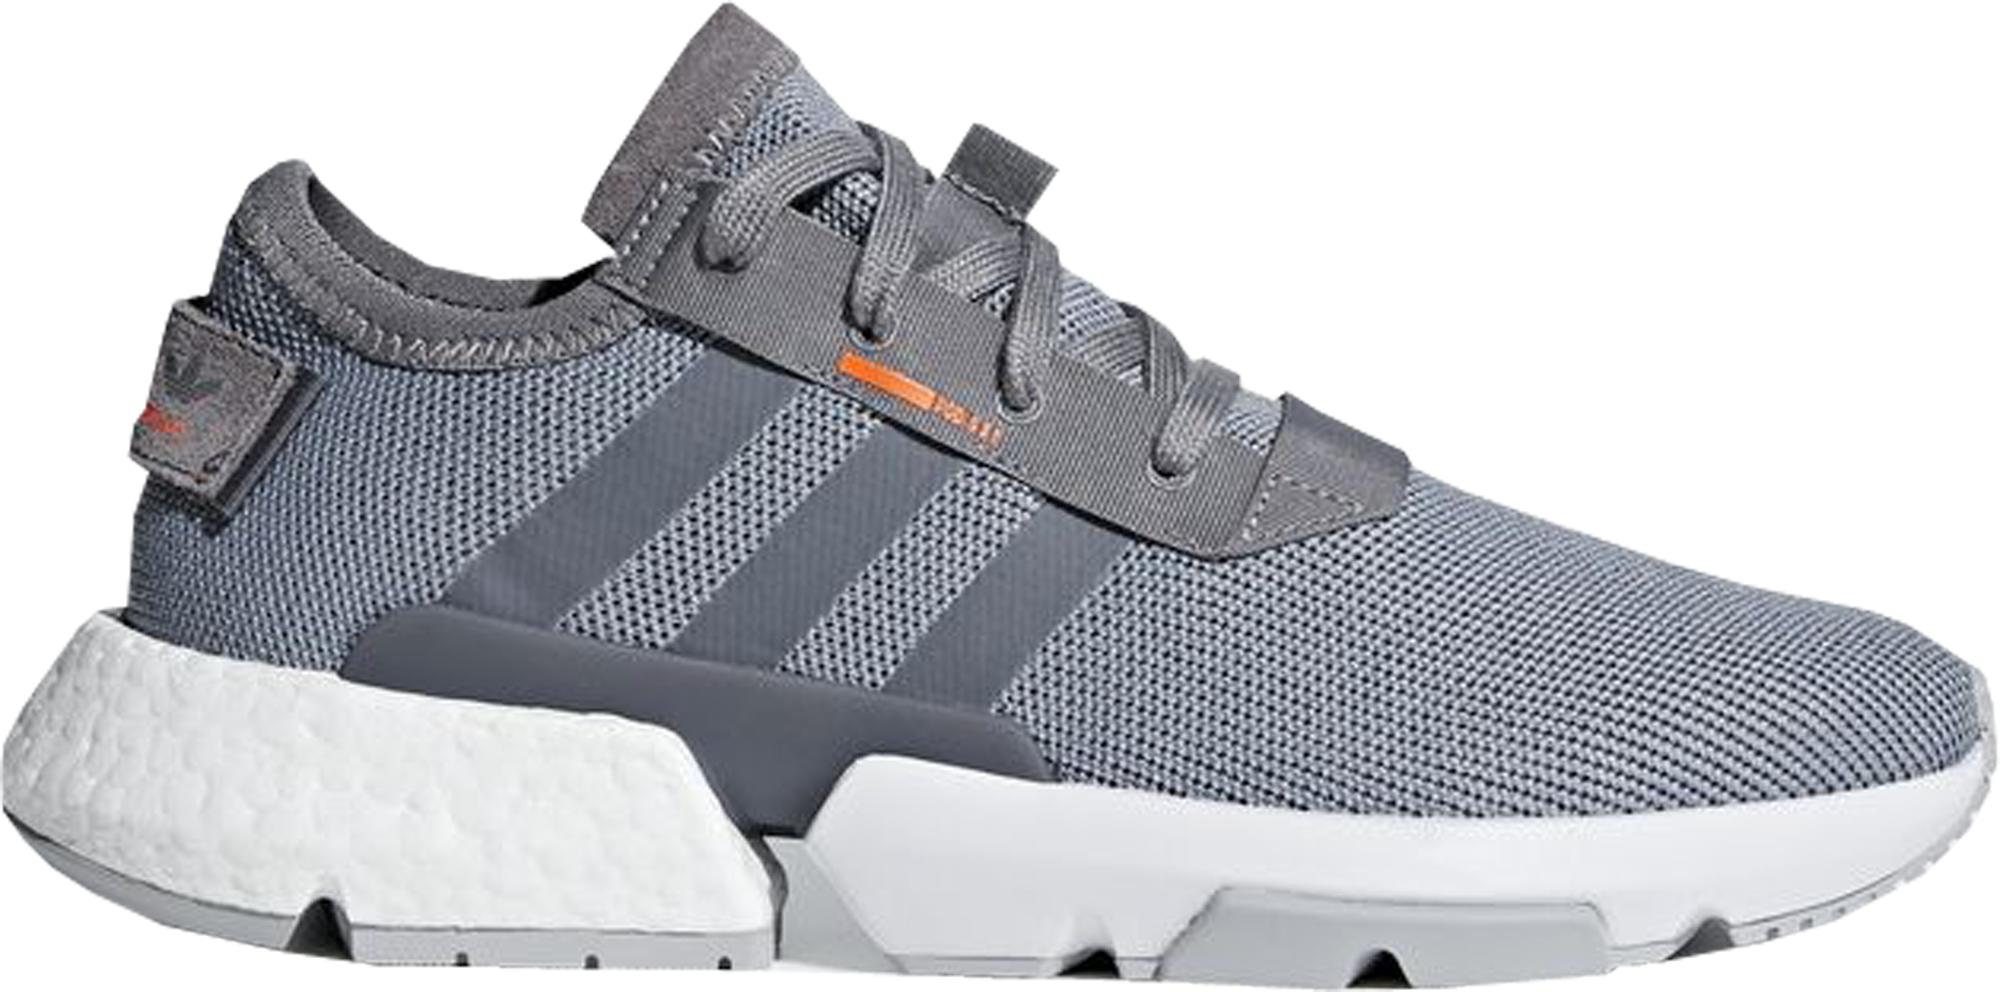 Adidas POD-S3.1 Grey Solar Orange